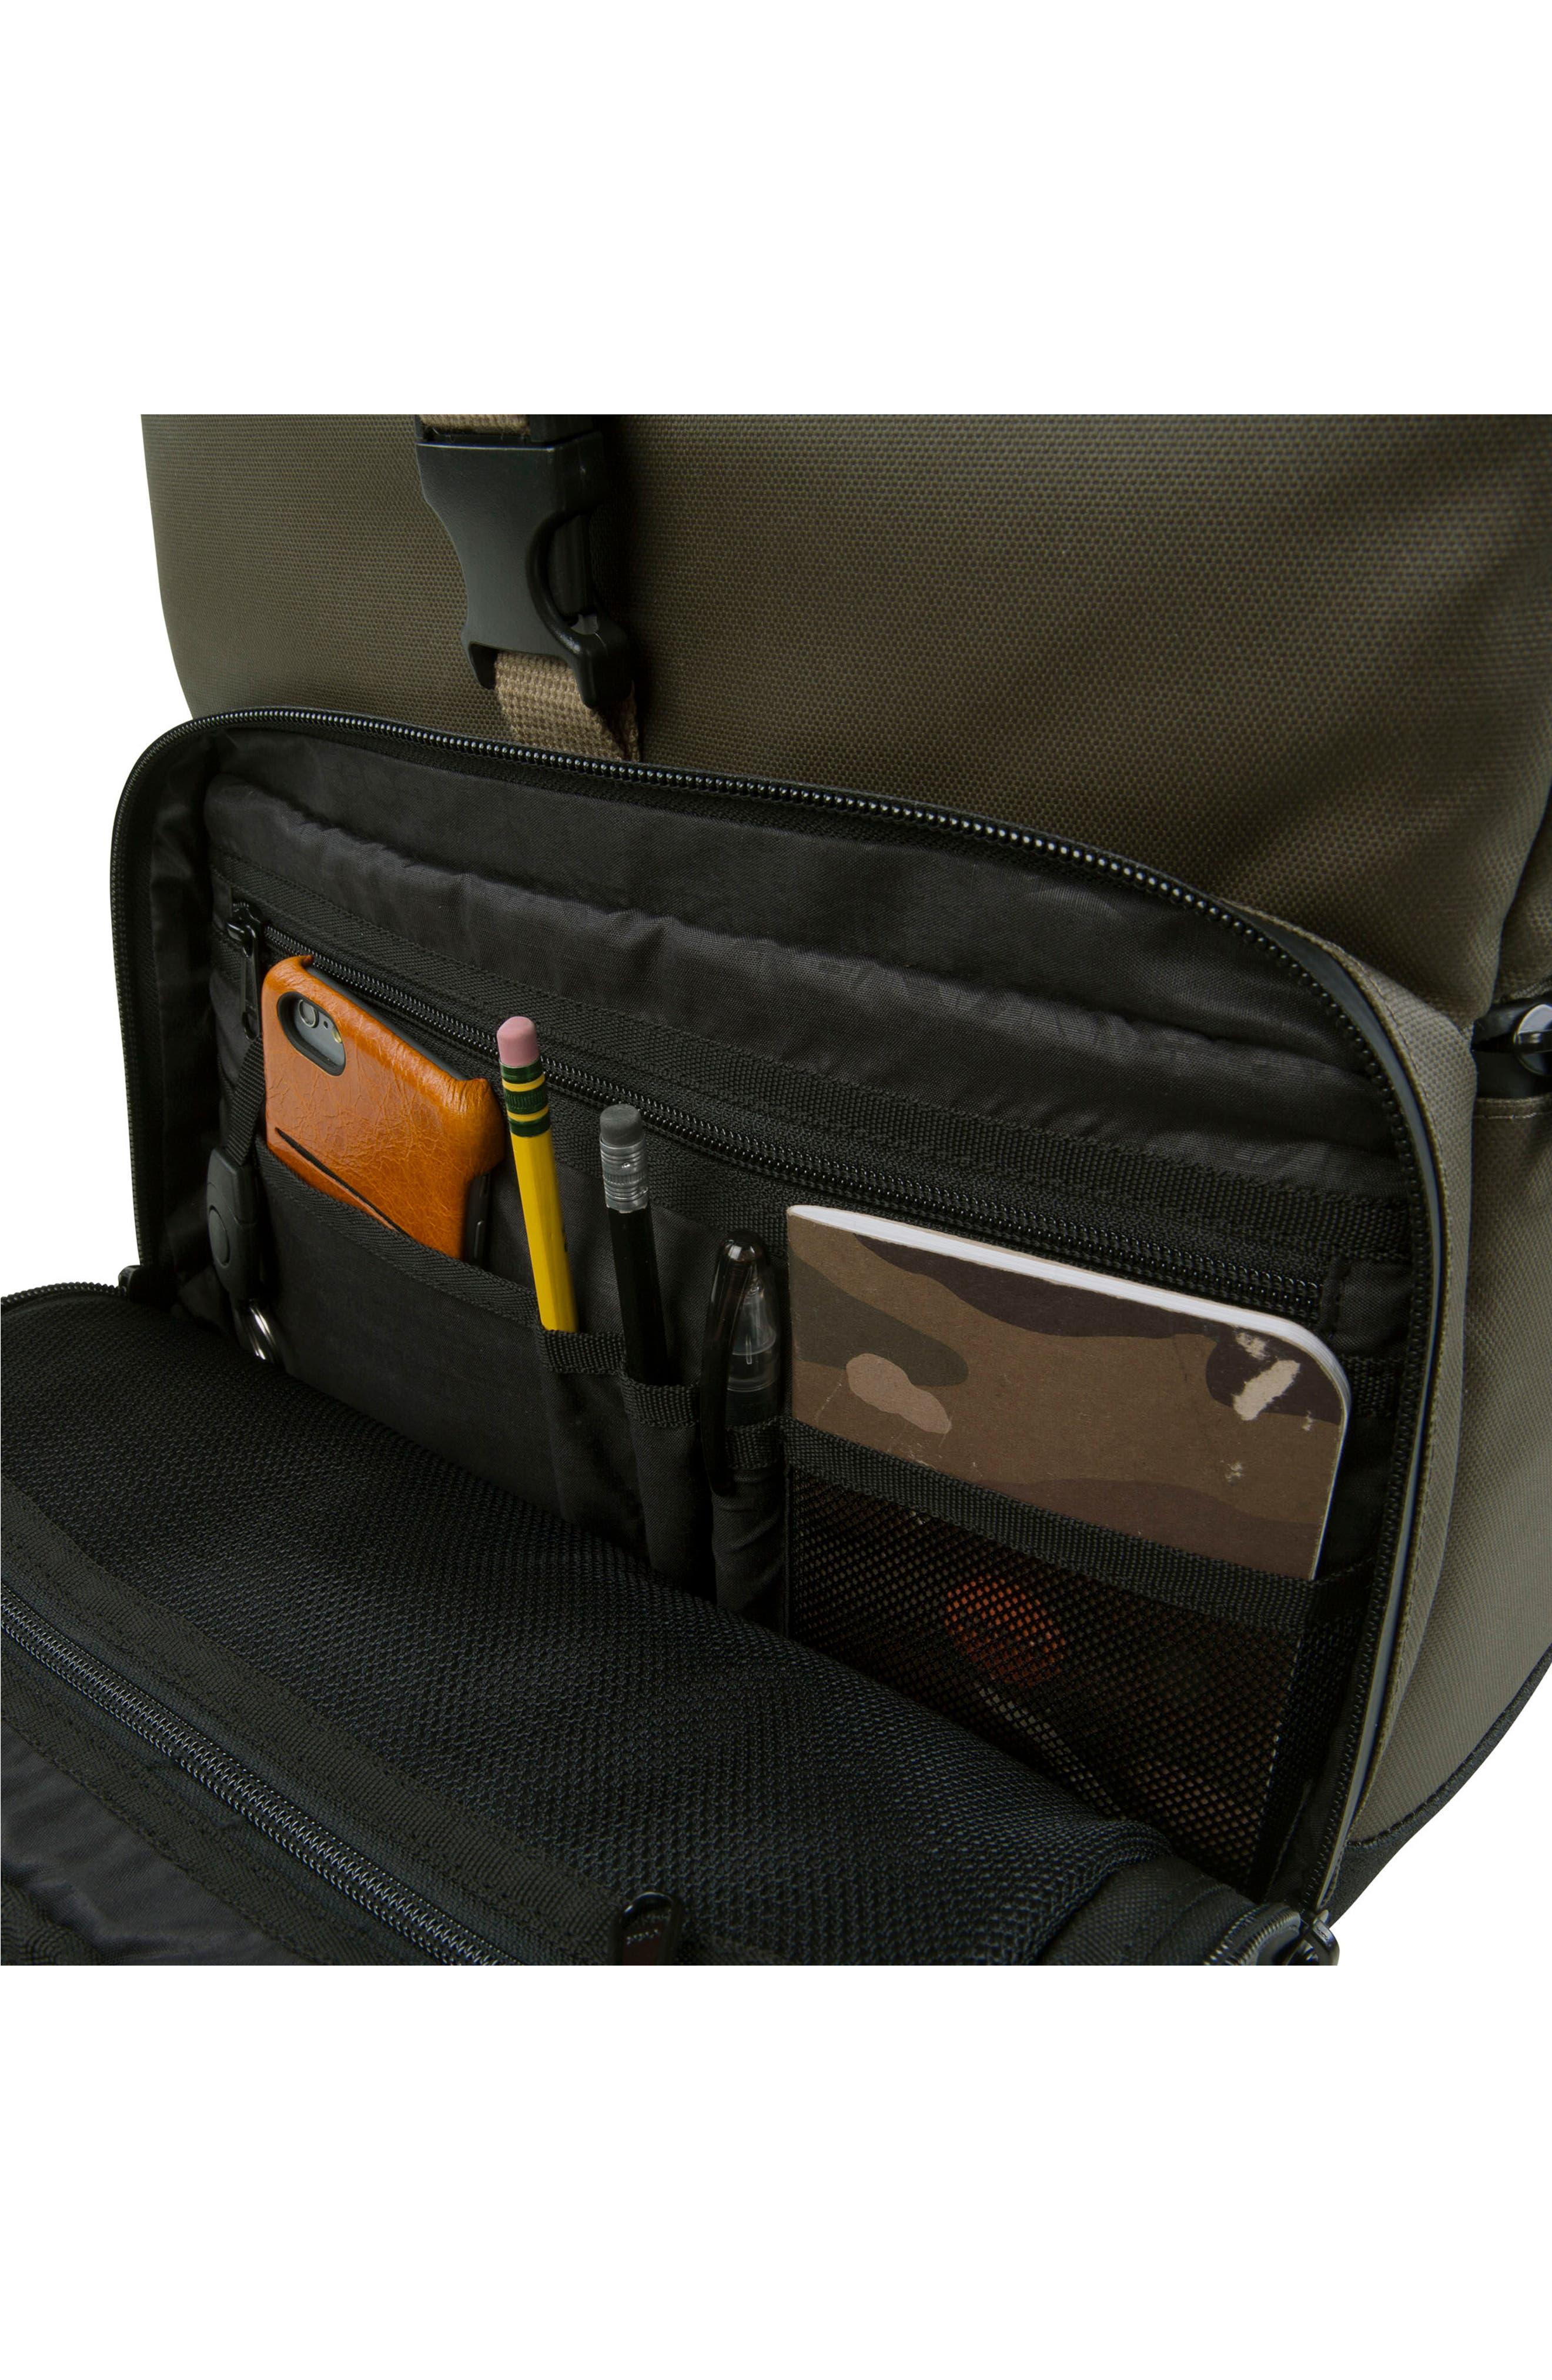 DSLR Camera Backpack,                             Alternate thumbnail 8, color,                             350